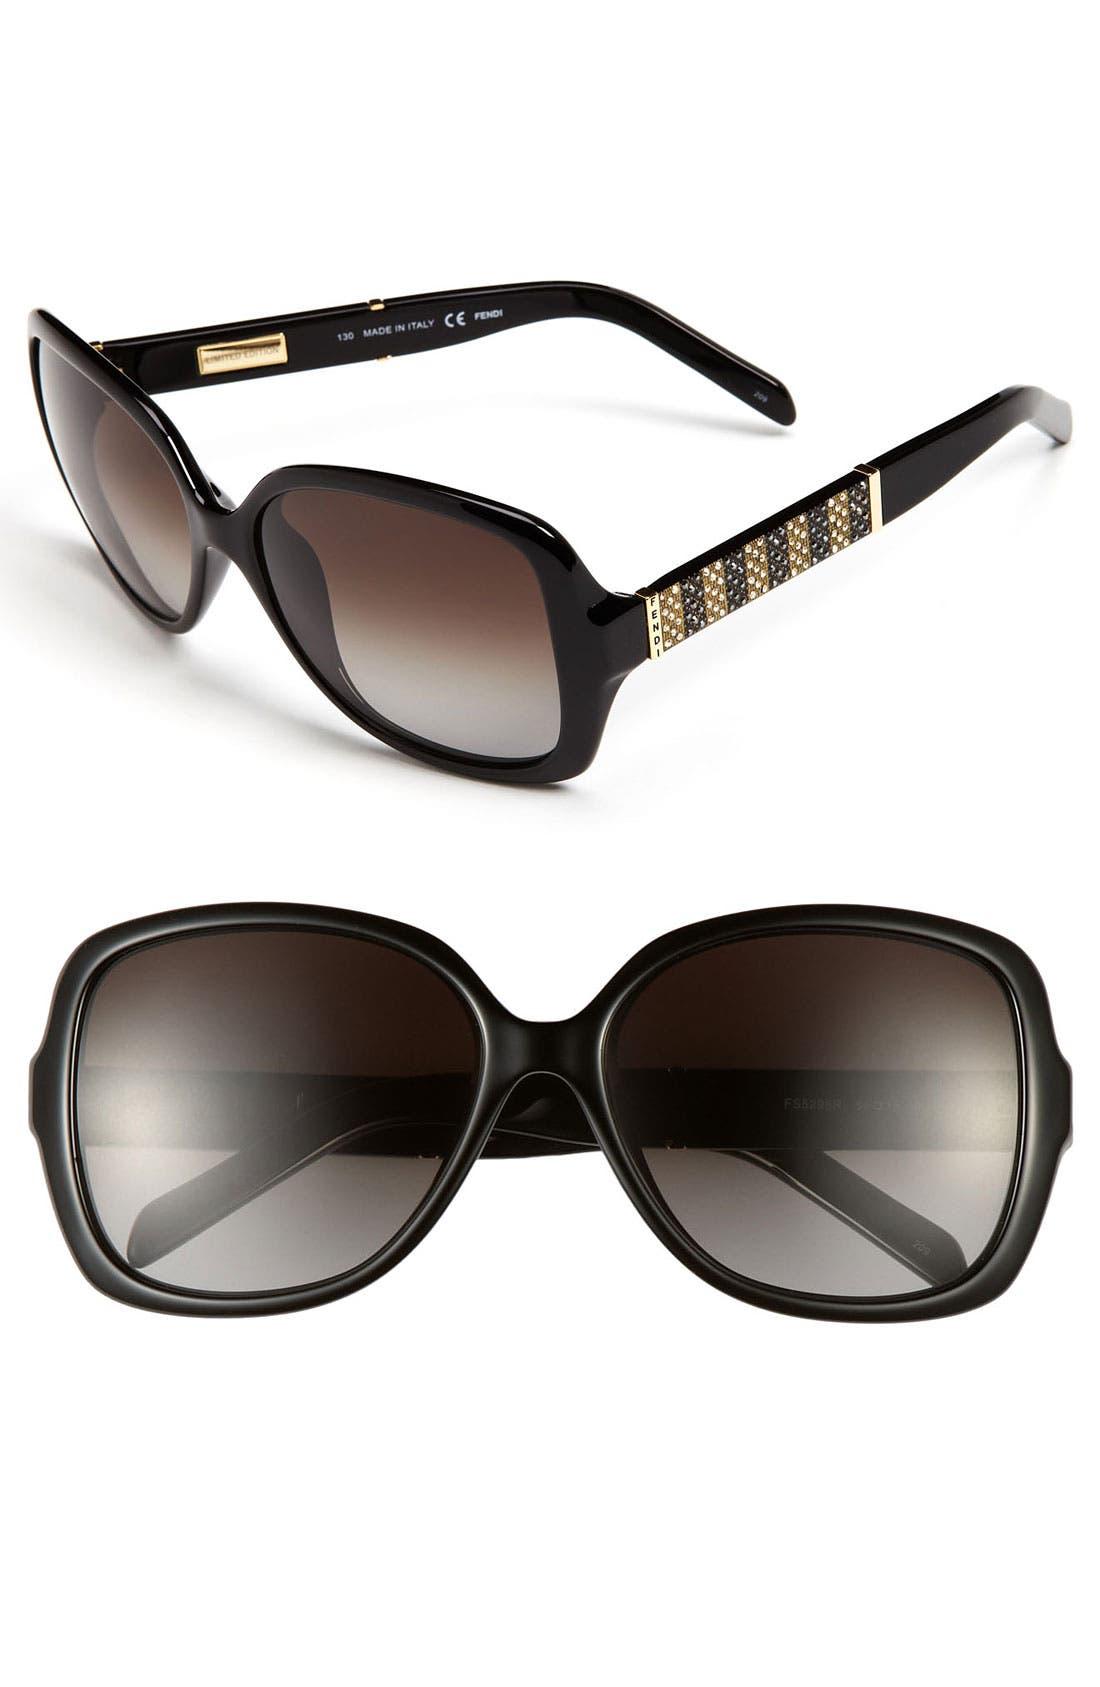 Alternate Image 1 Selected - Fendi 56mm Oversized Sunglasses